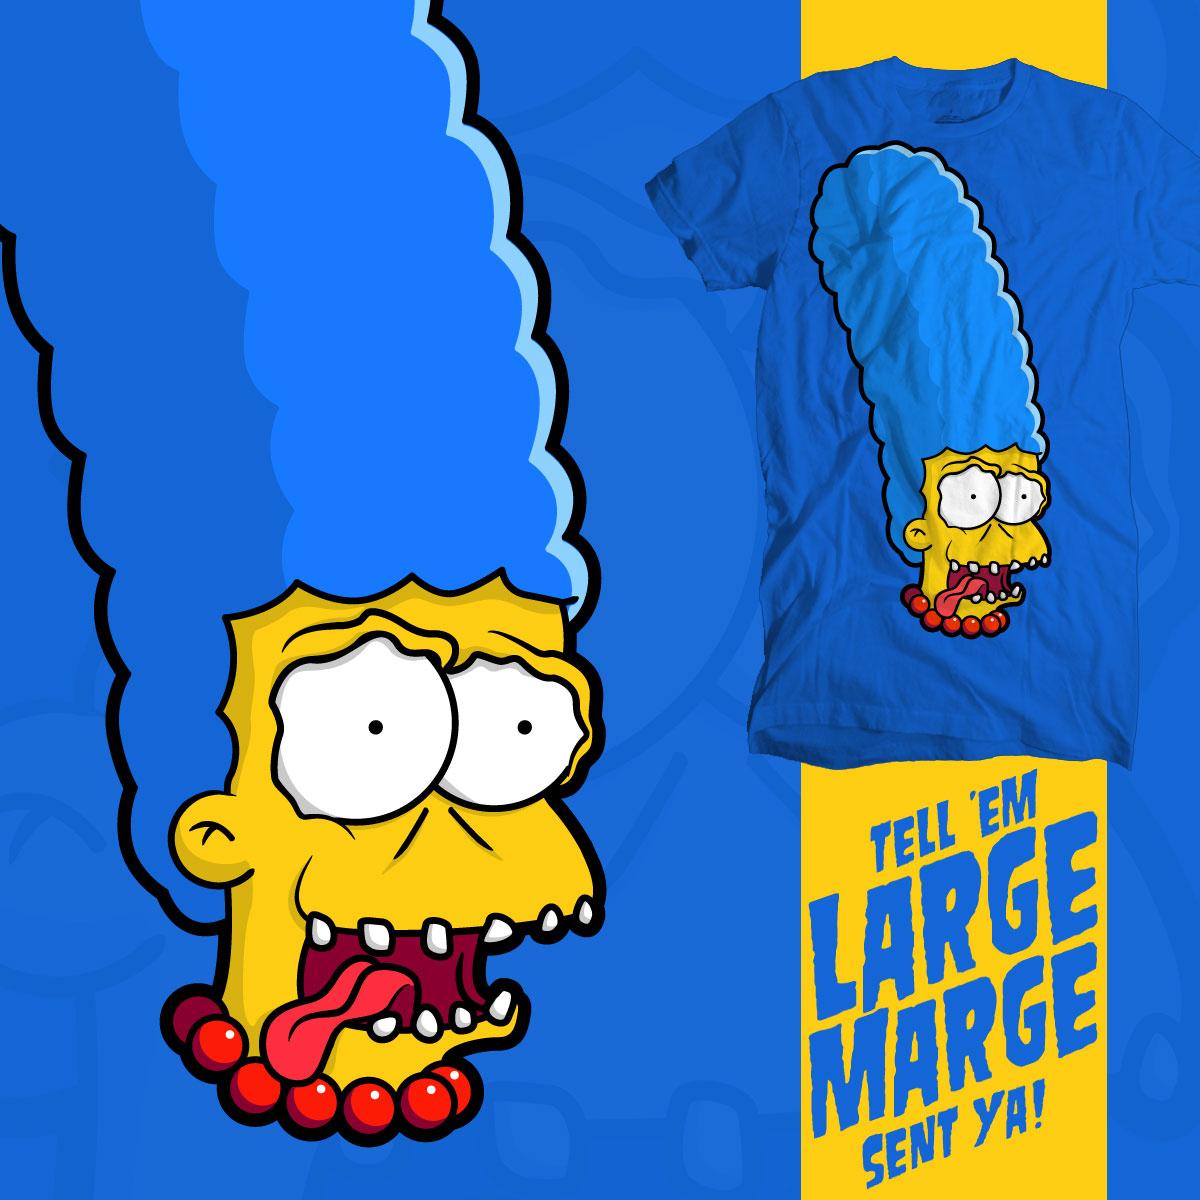 Tell 'Em Large Marge Sent Ya! by Papaprime on Threadless